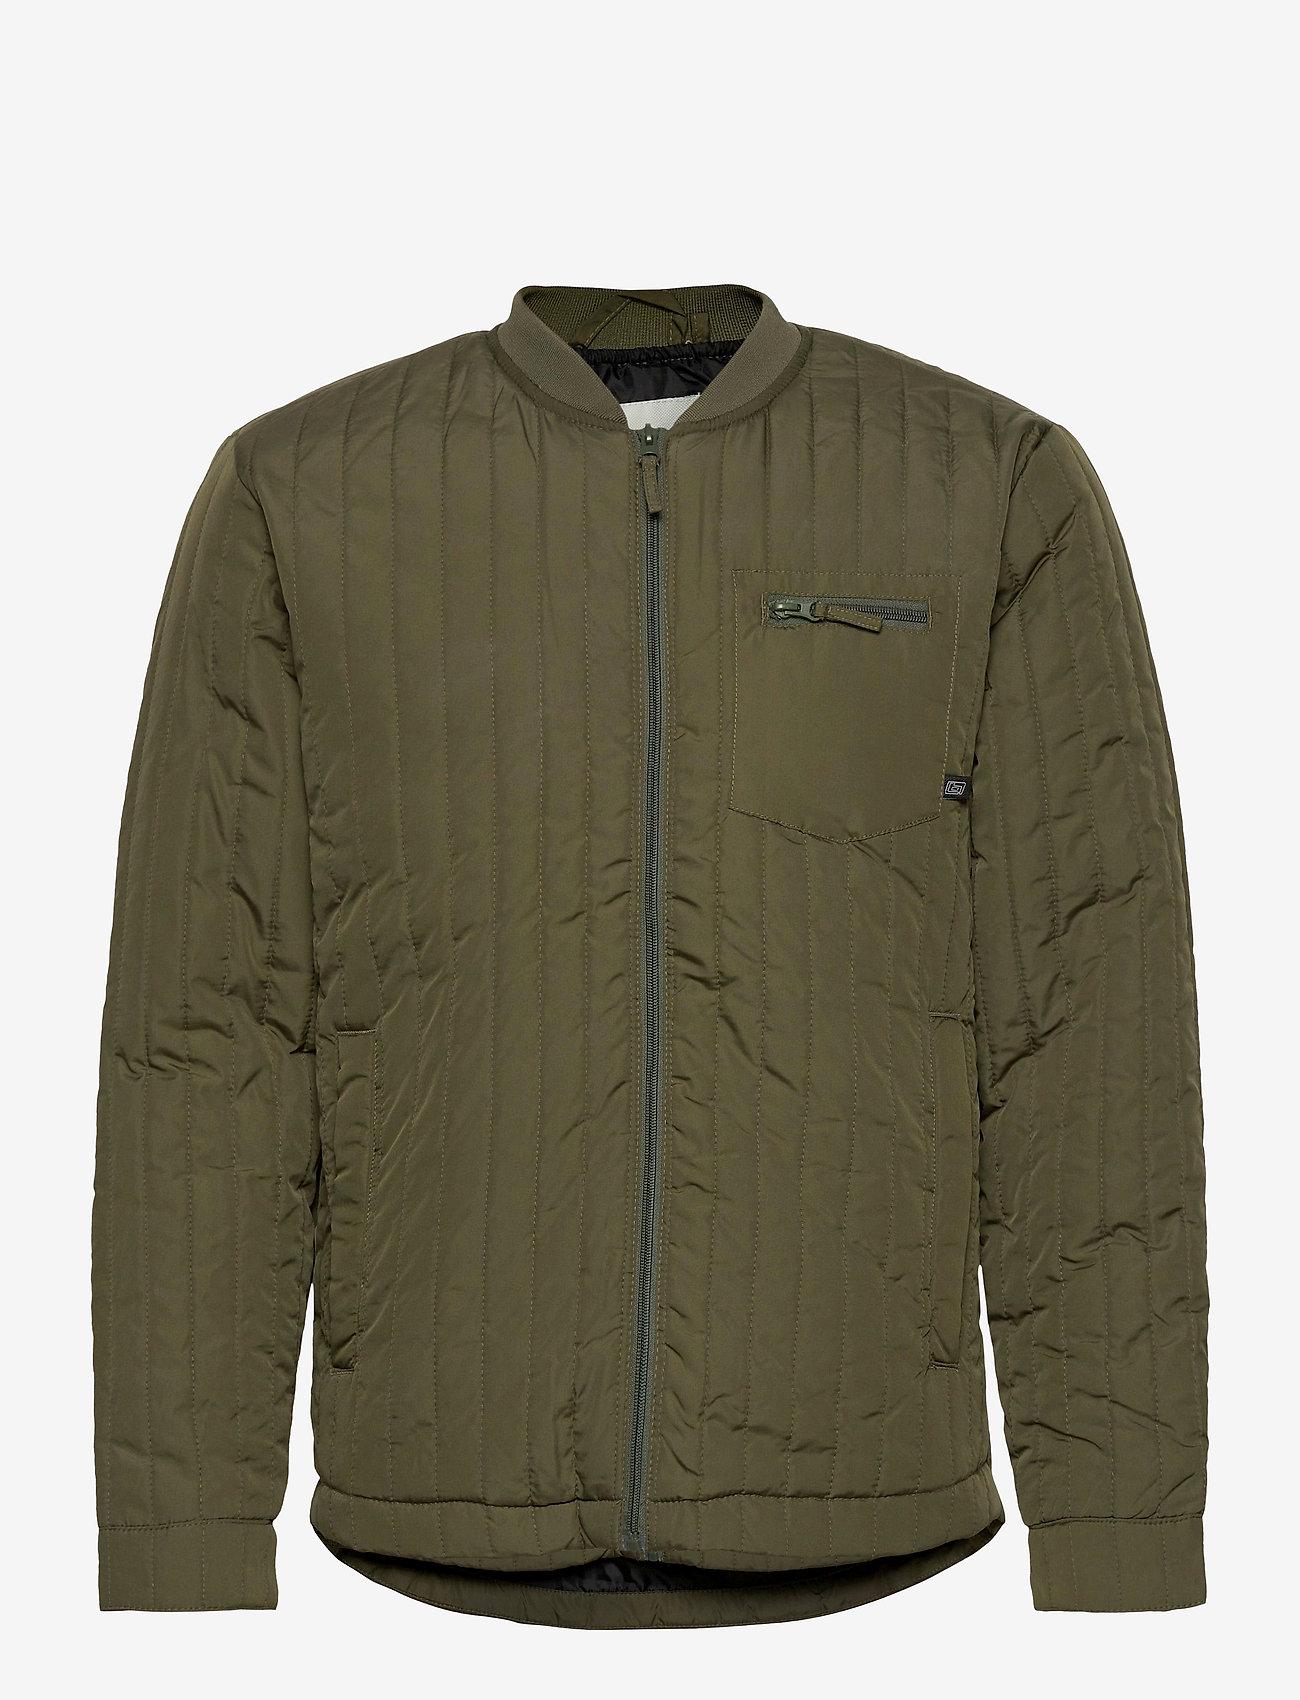 Blend - Outerwear - donsjassen - dusty olive - 0